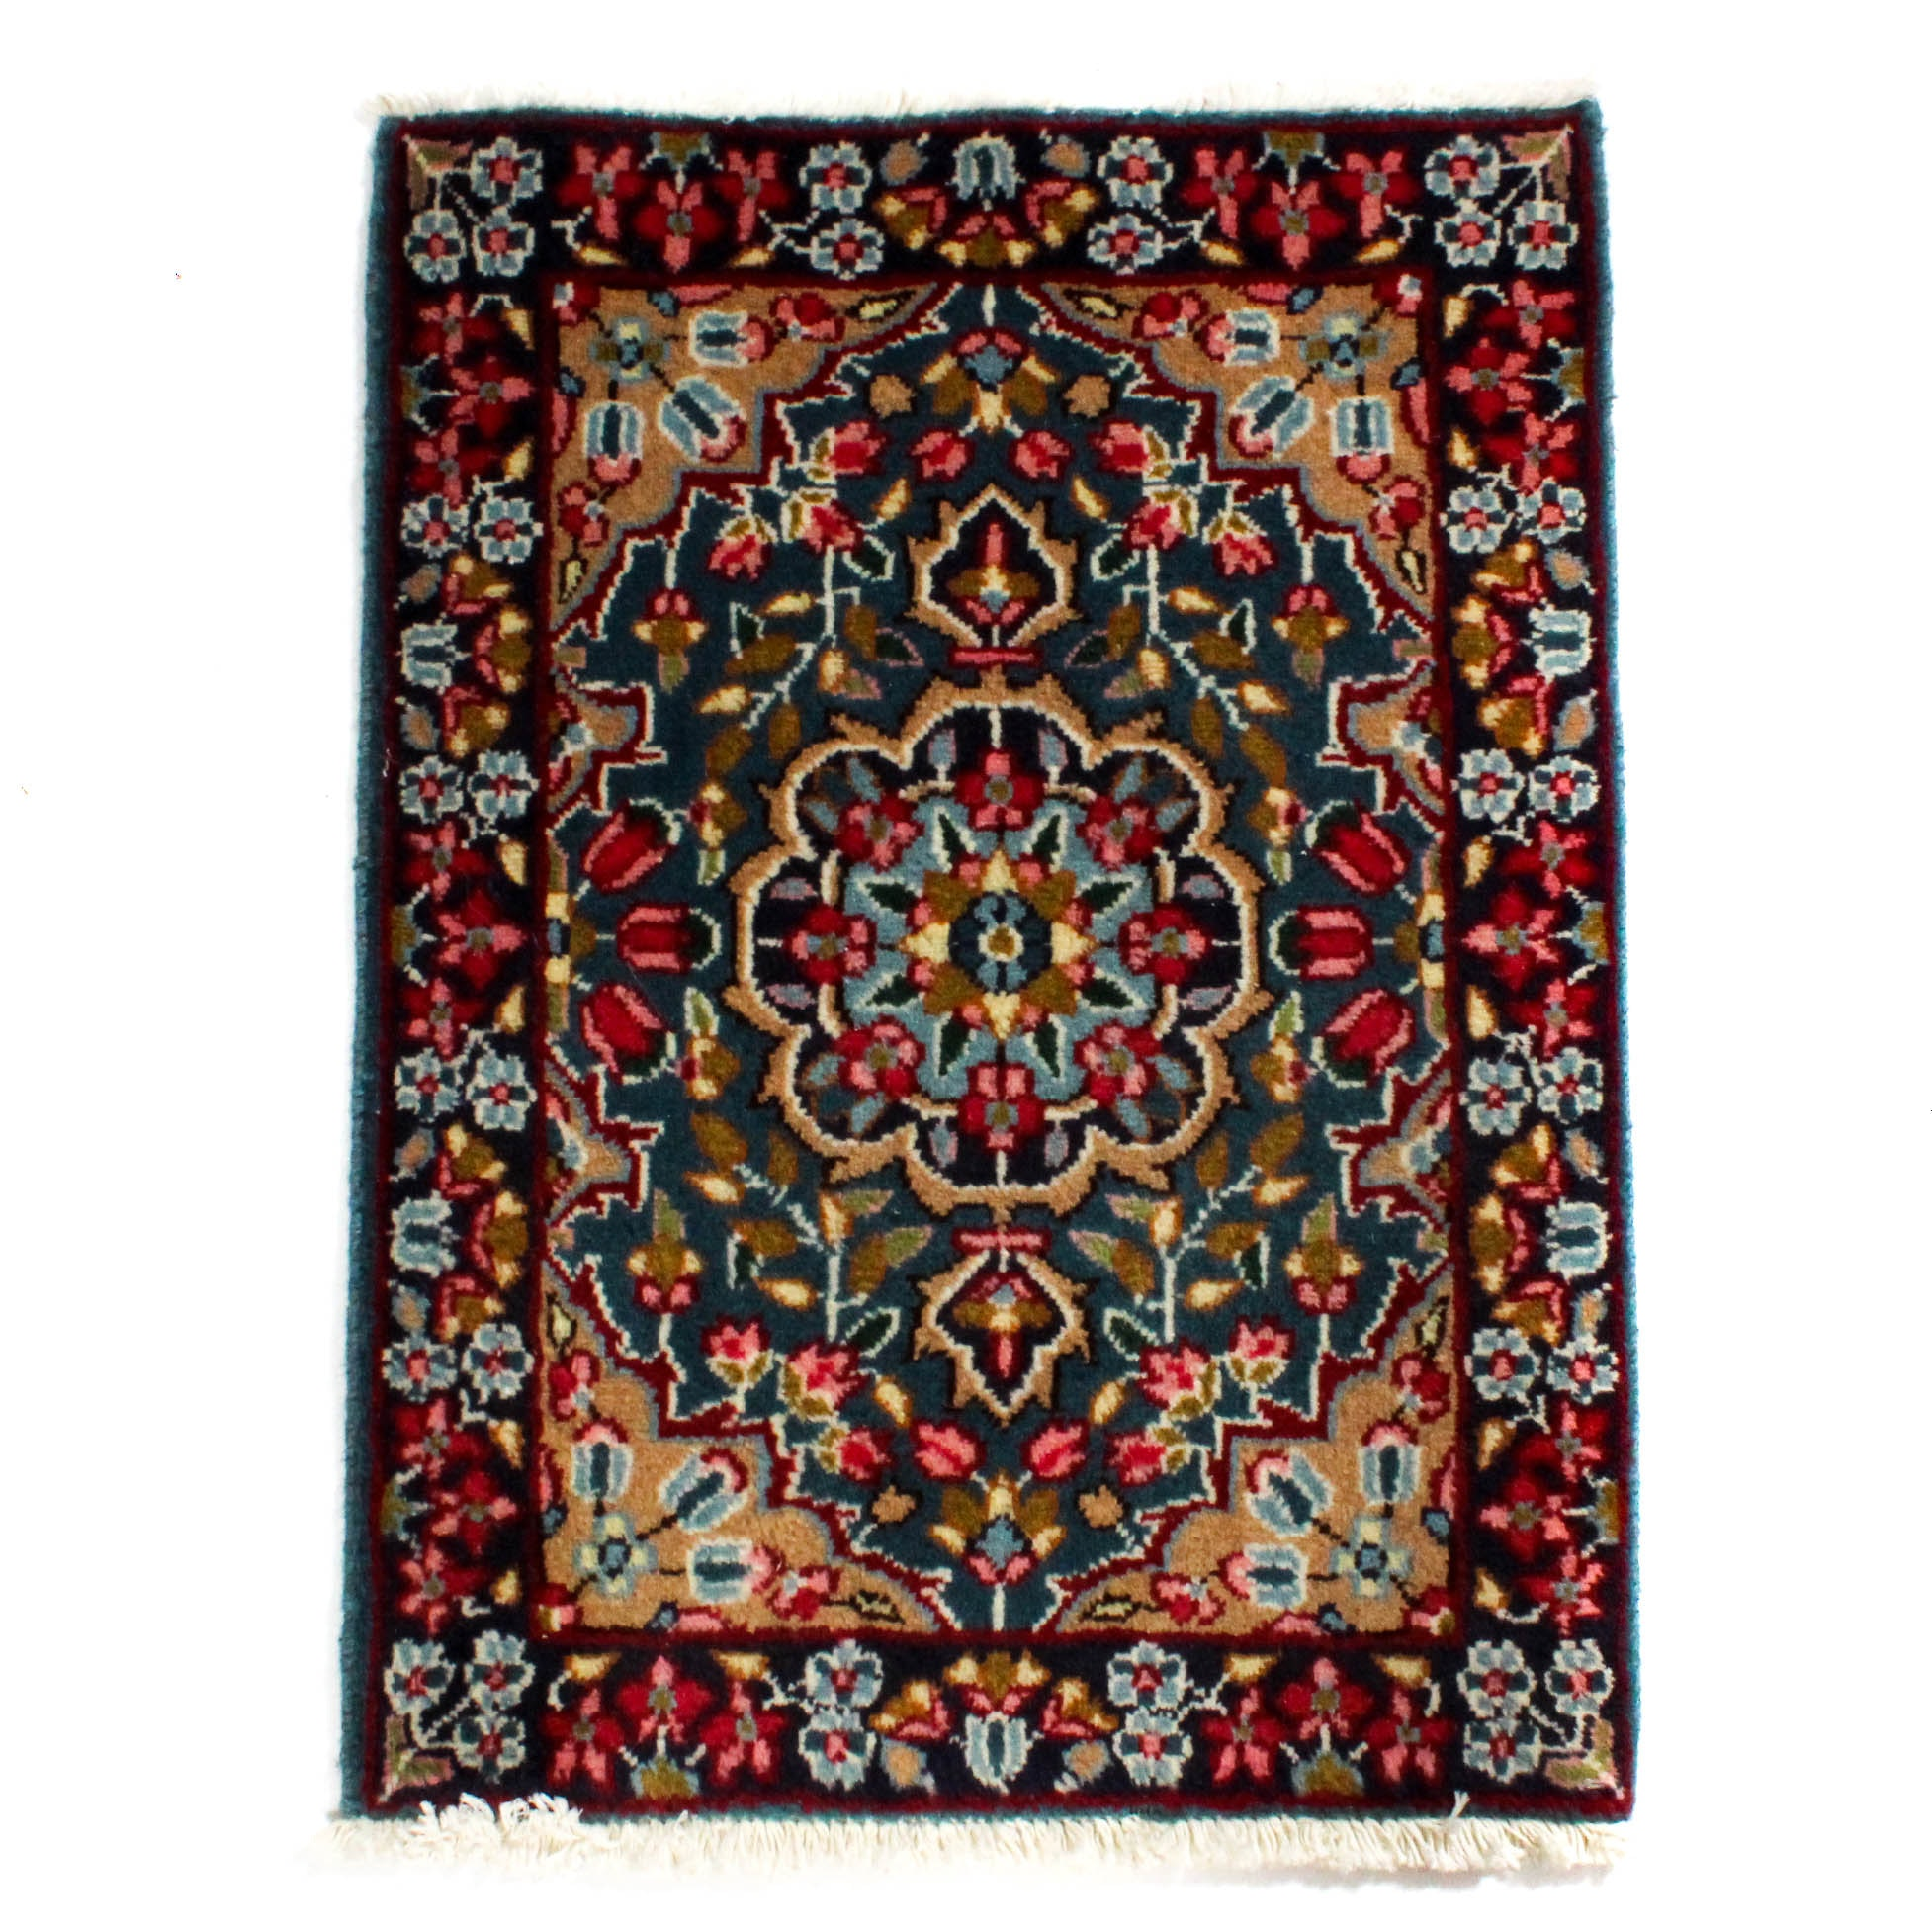 1'11 x 2'9 Semi-Antique Fine Hand-Knotted Persian Lavar Kerman Rug